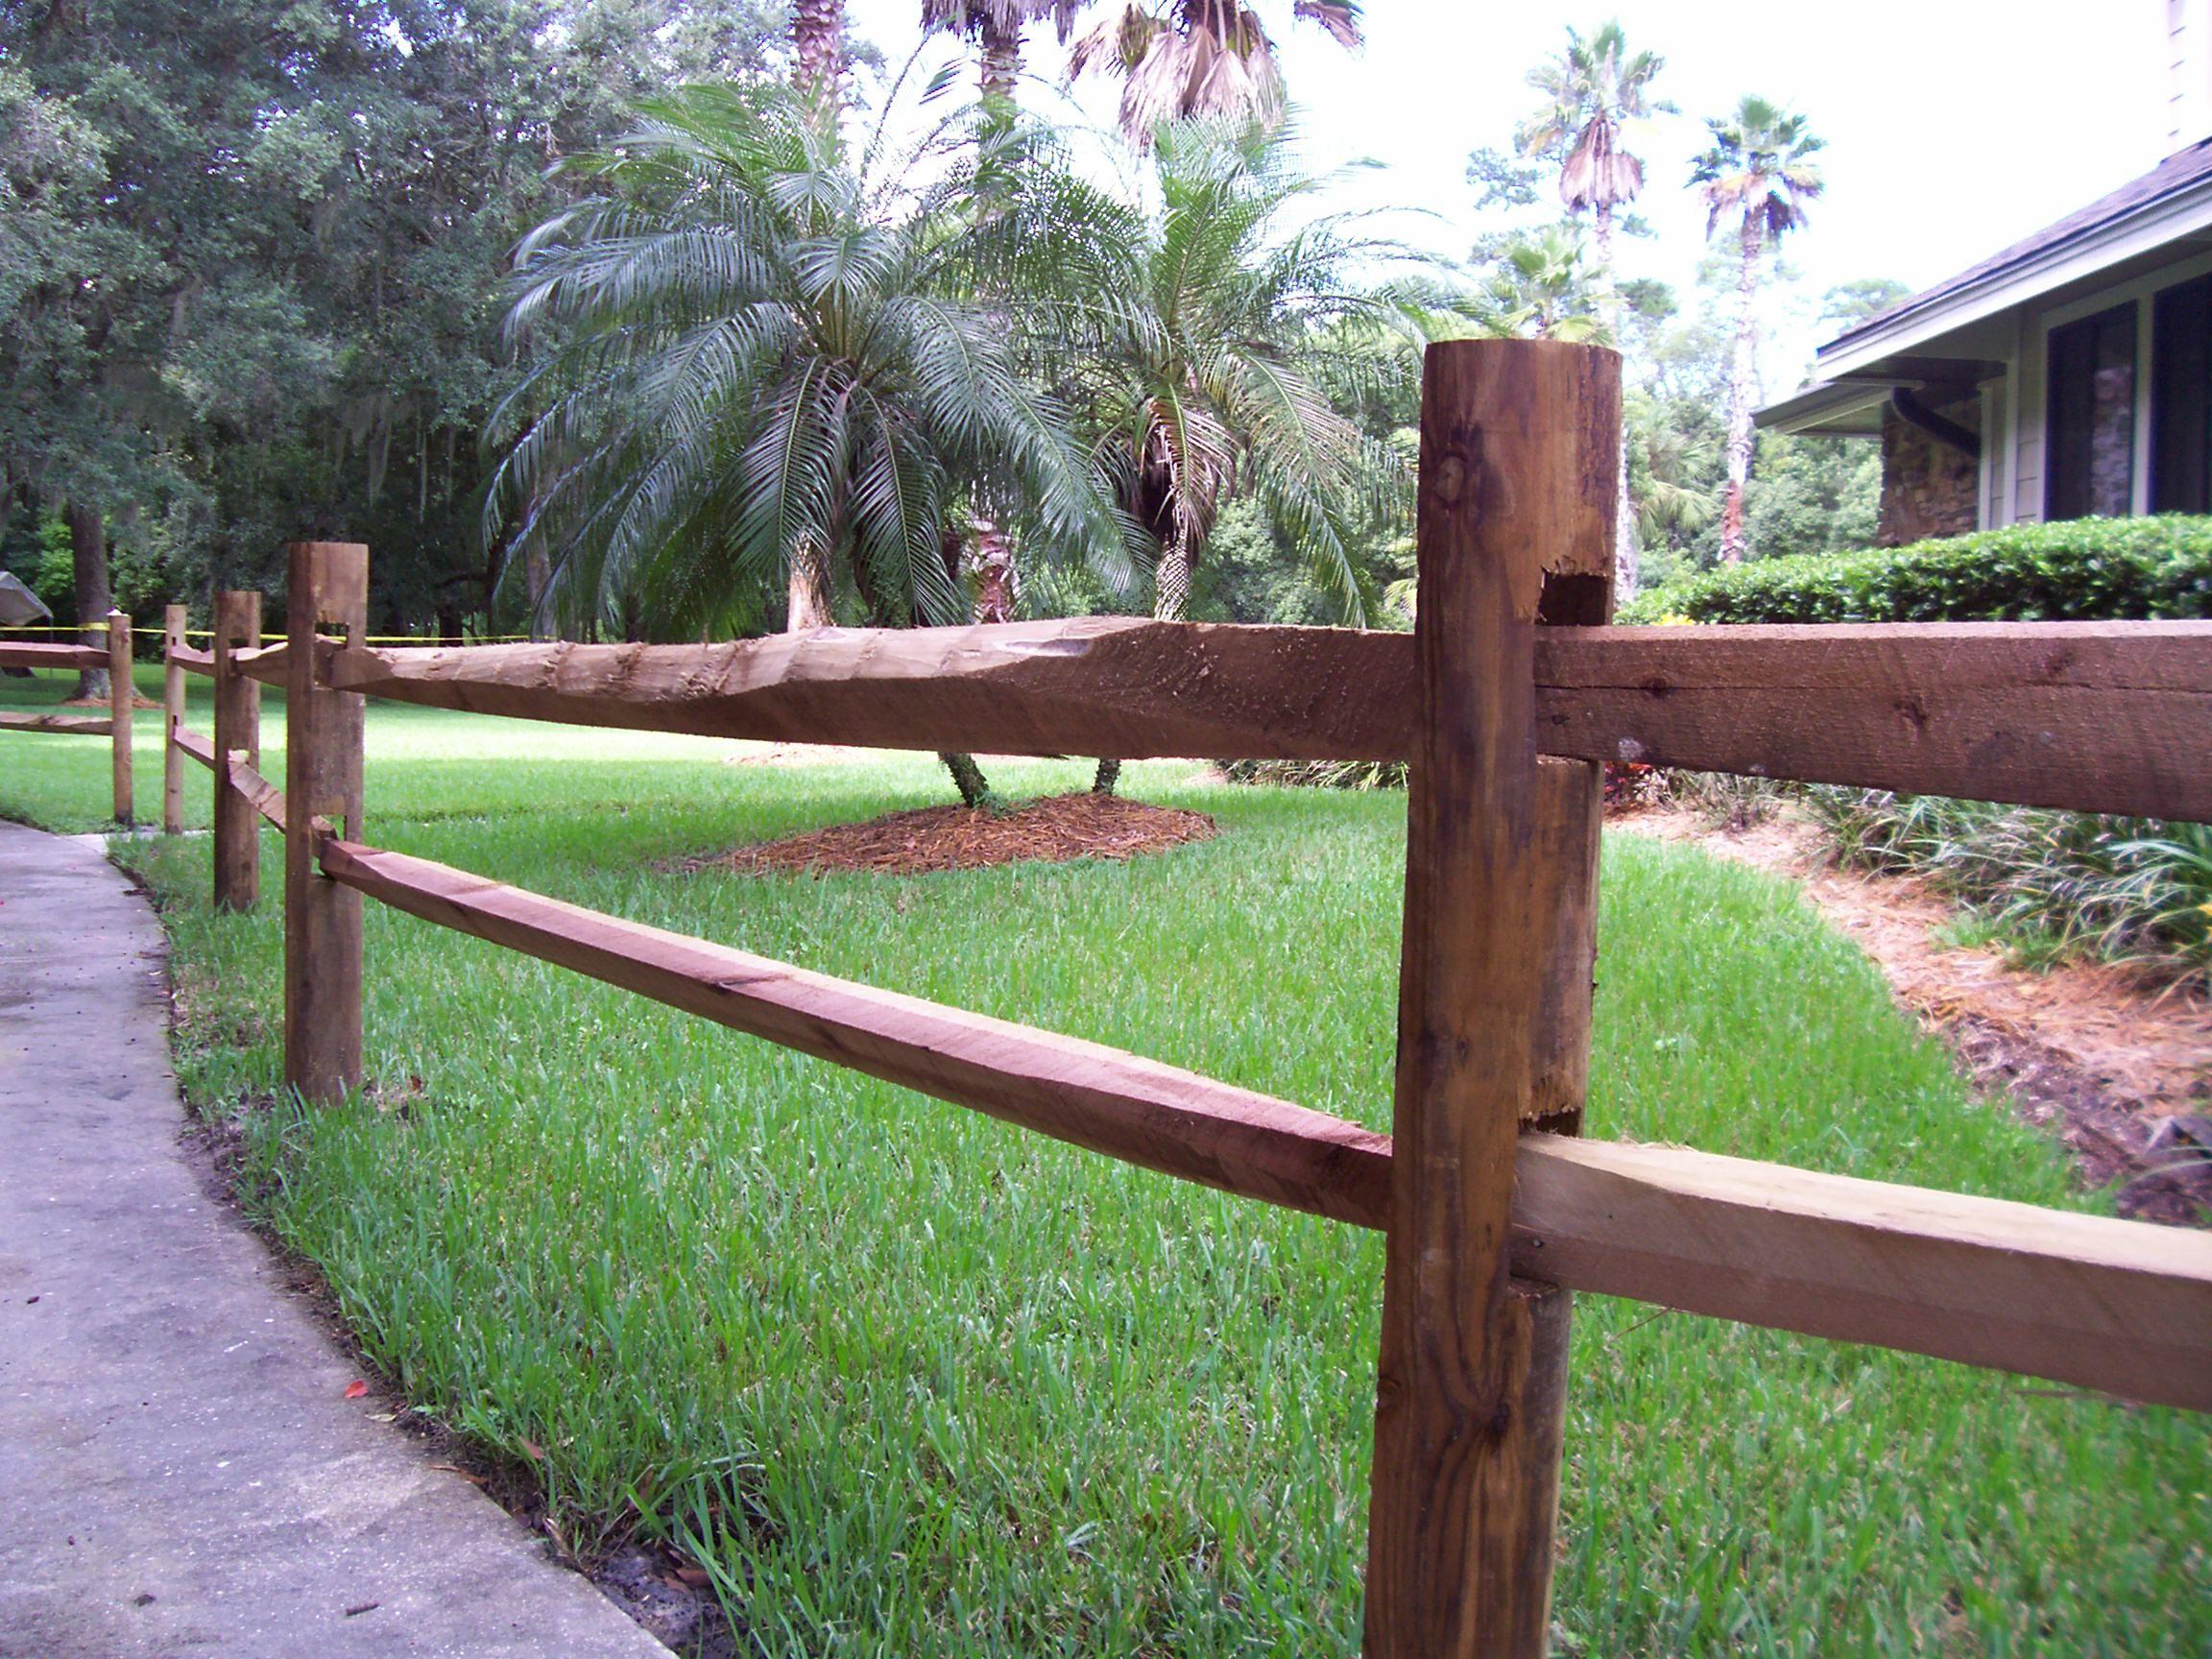 Mossy Oak Fence Driveway Fence Split Rail Fence Fence